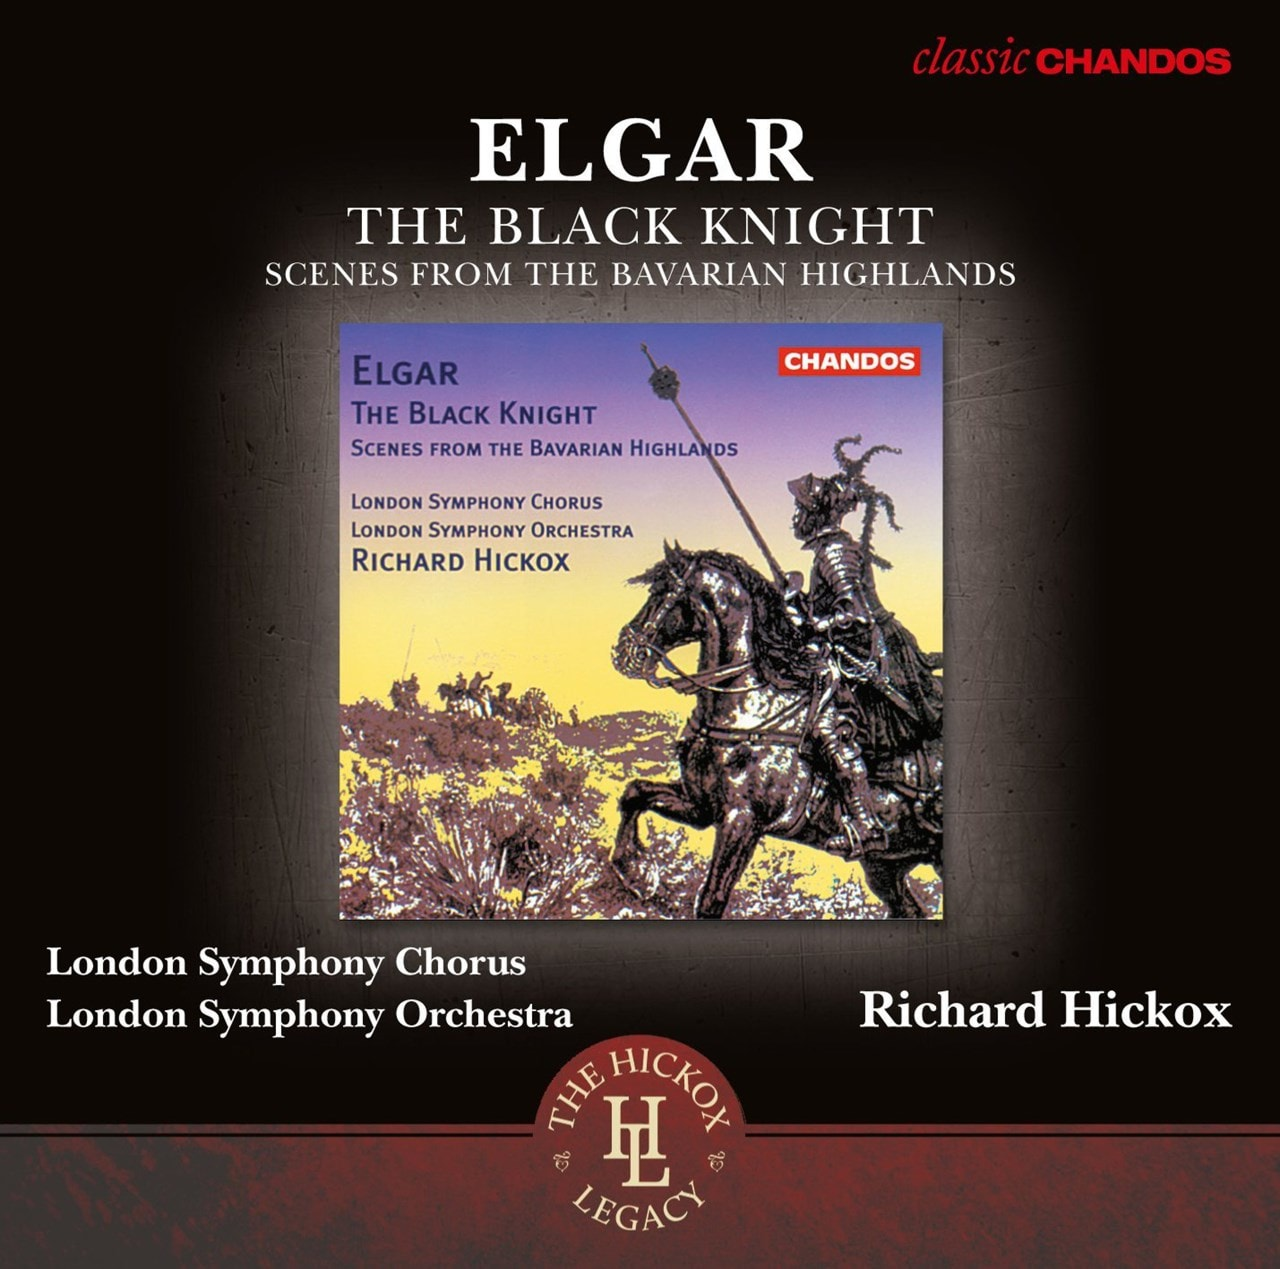 Elgar: The Black Knight/Scenes from the Bavarian Highlands - 1